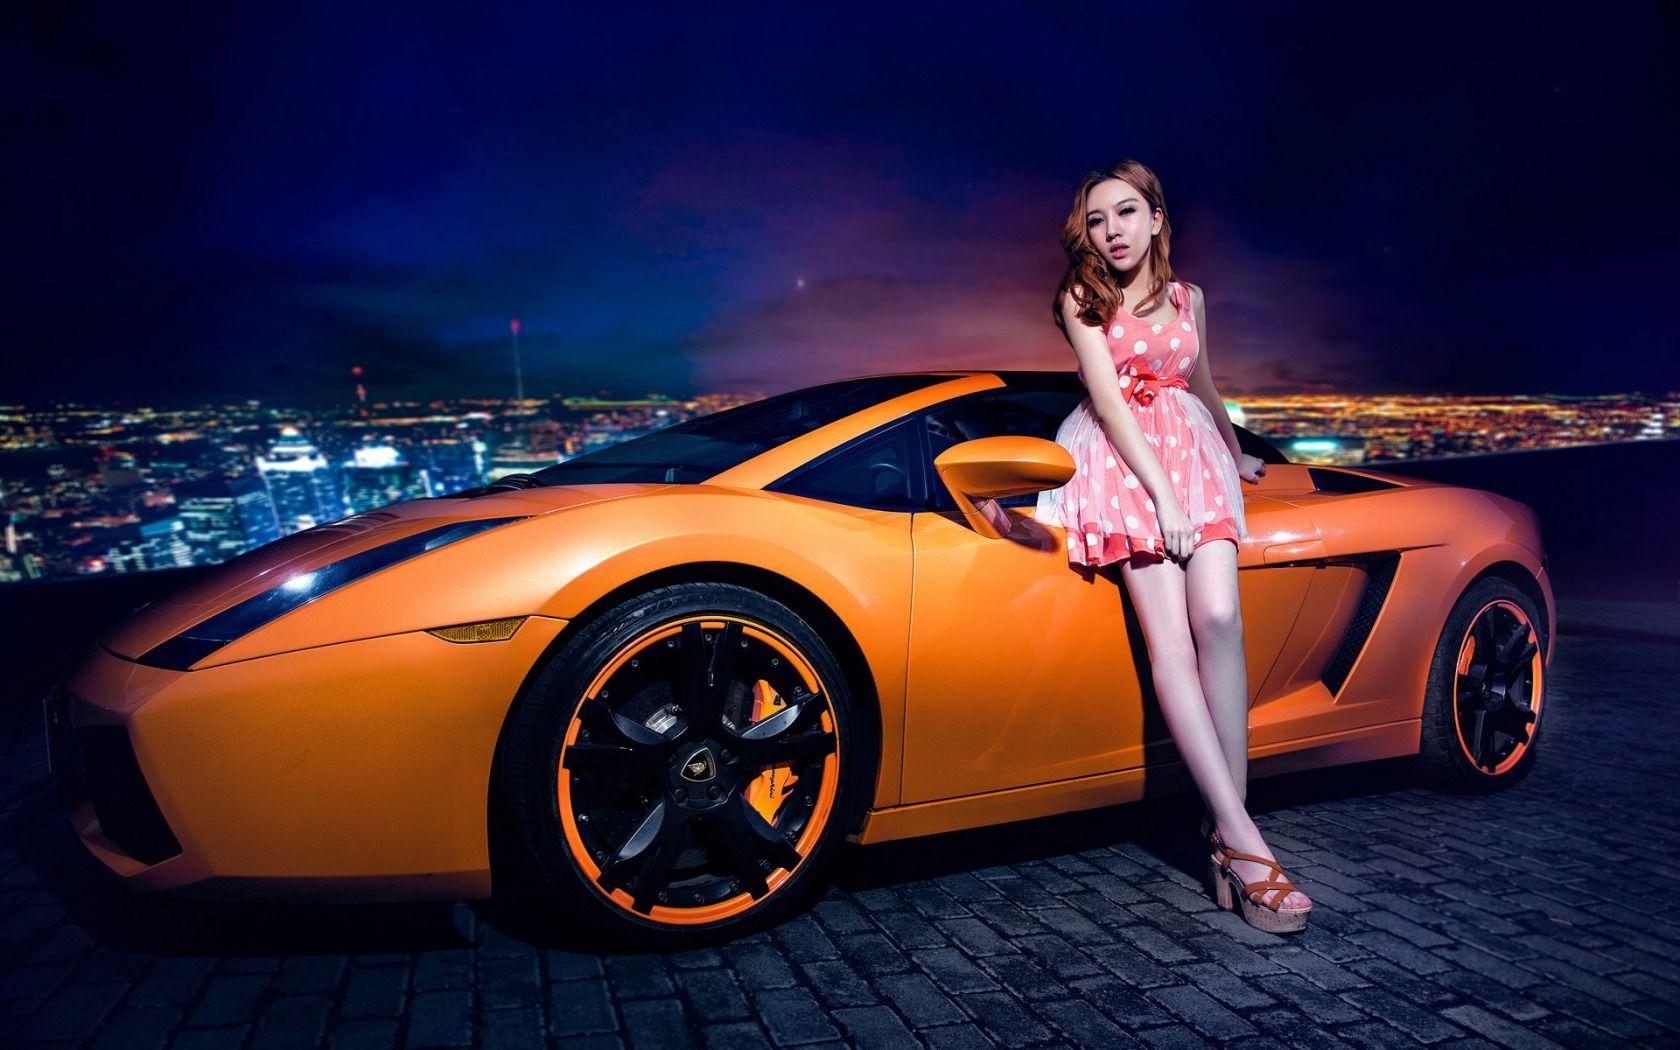 Lamborghini Gallardo With Pretty Girl Jpg Women